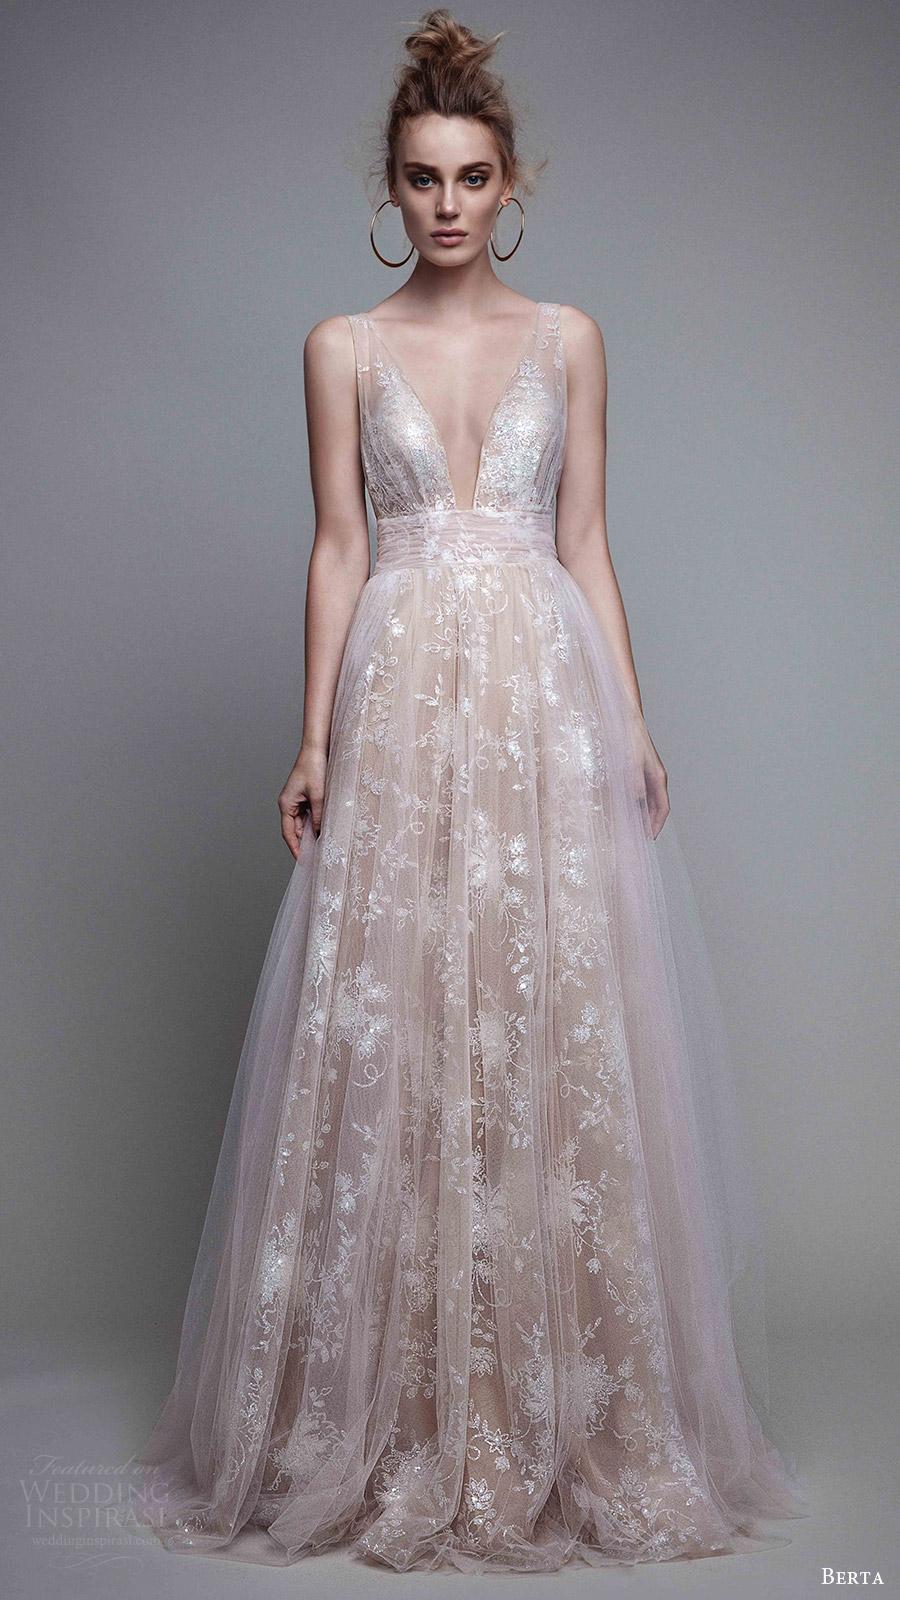 berta rtw fall 2017 (17 26) sleeveless deep vneck a line blush evening wedding dress mv romantic